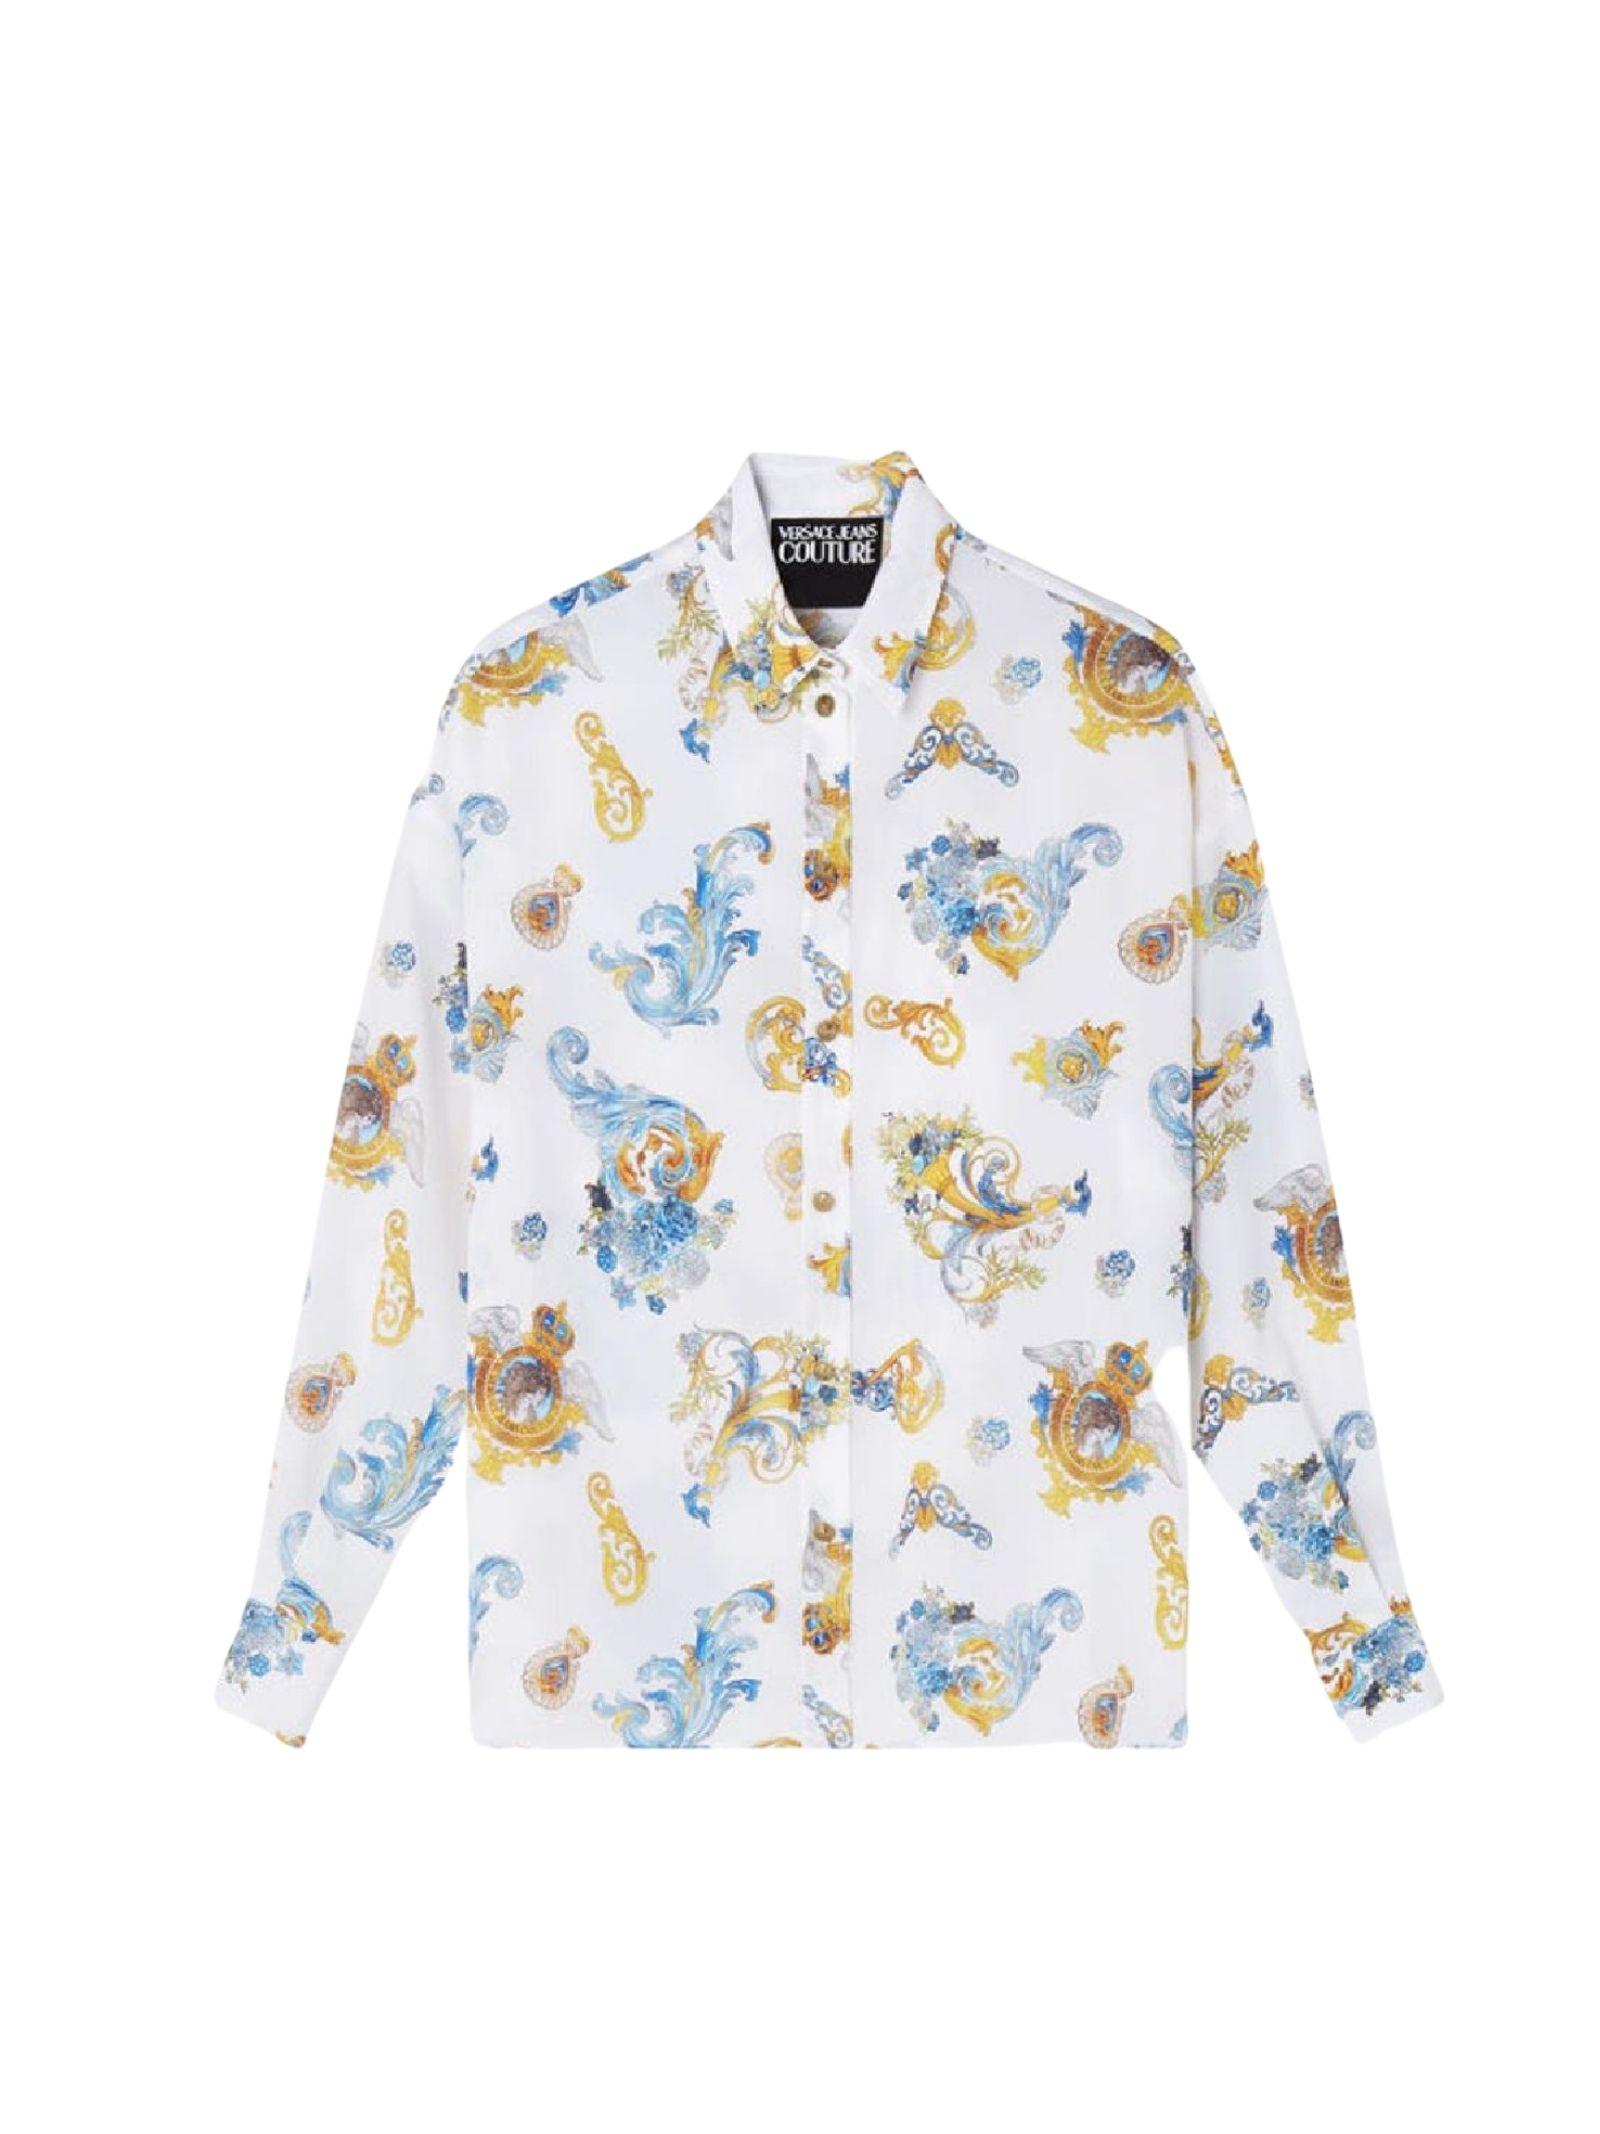 VERSACE JEANS | Shirt | B0HWA602S0996003